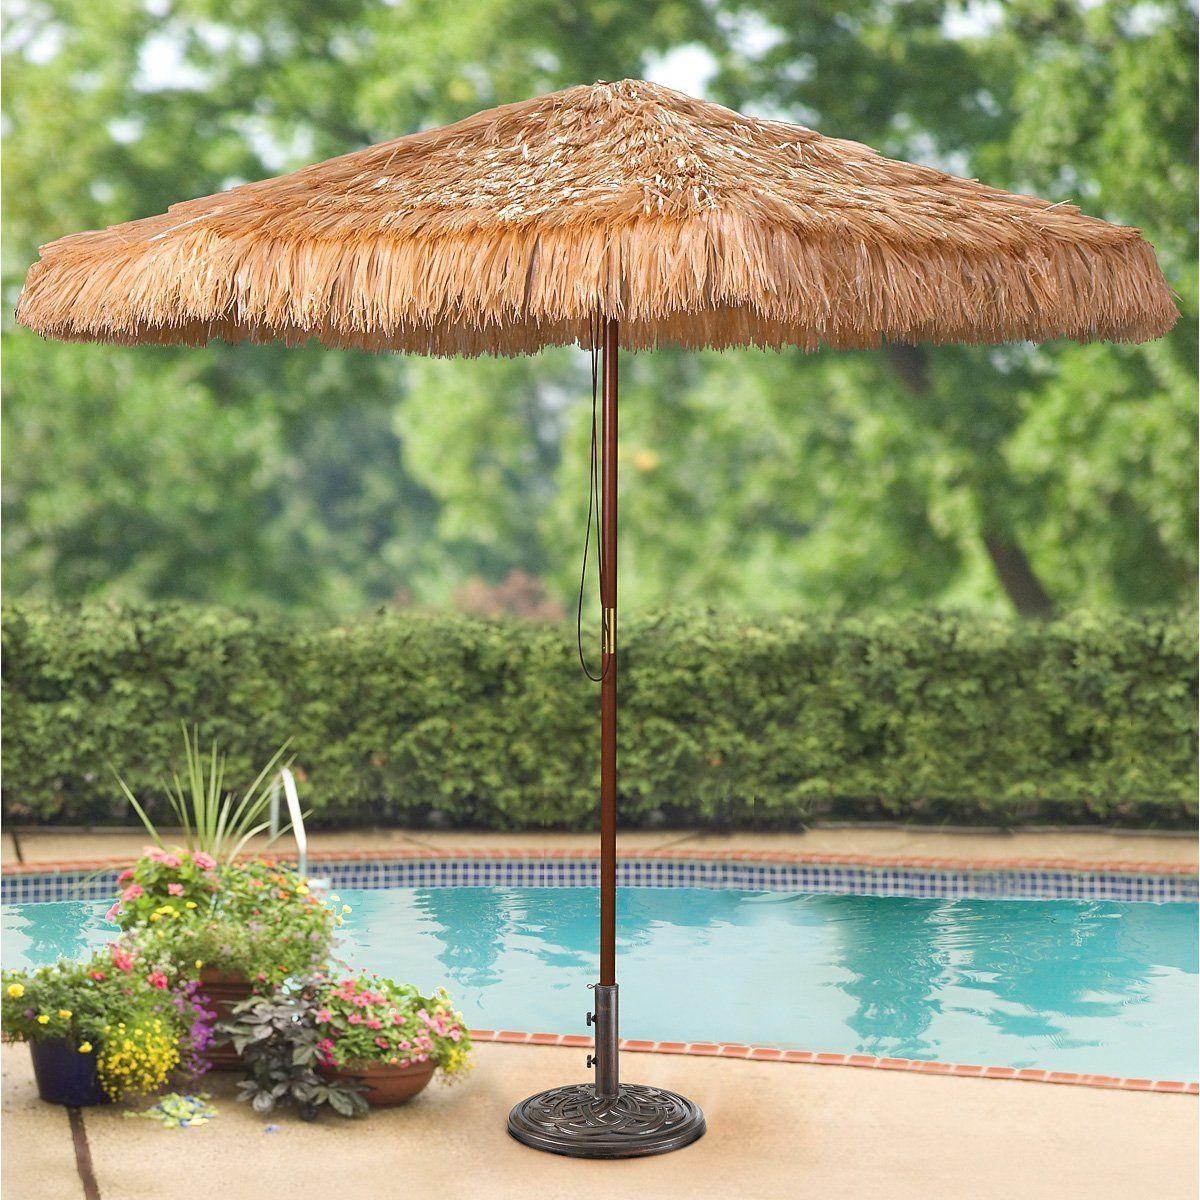 Tiki Patio Umbrella | Outdoor Goods